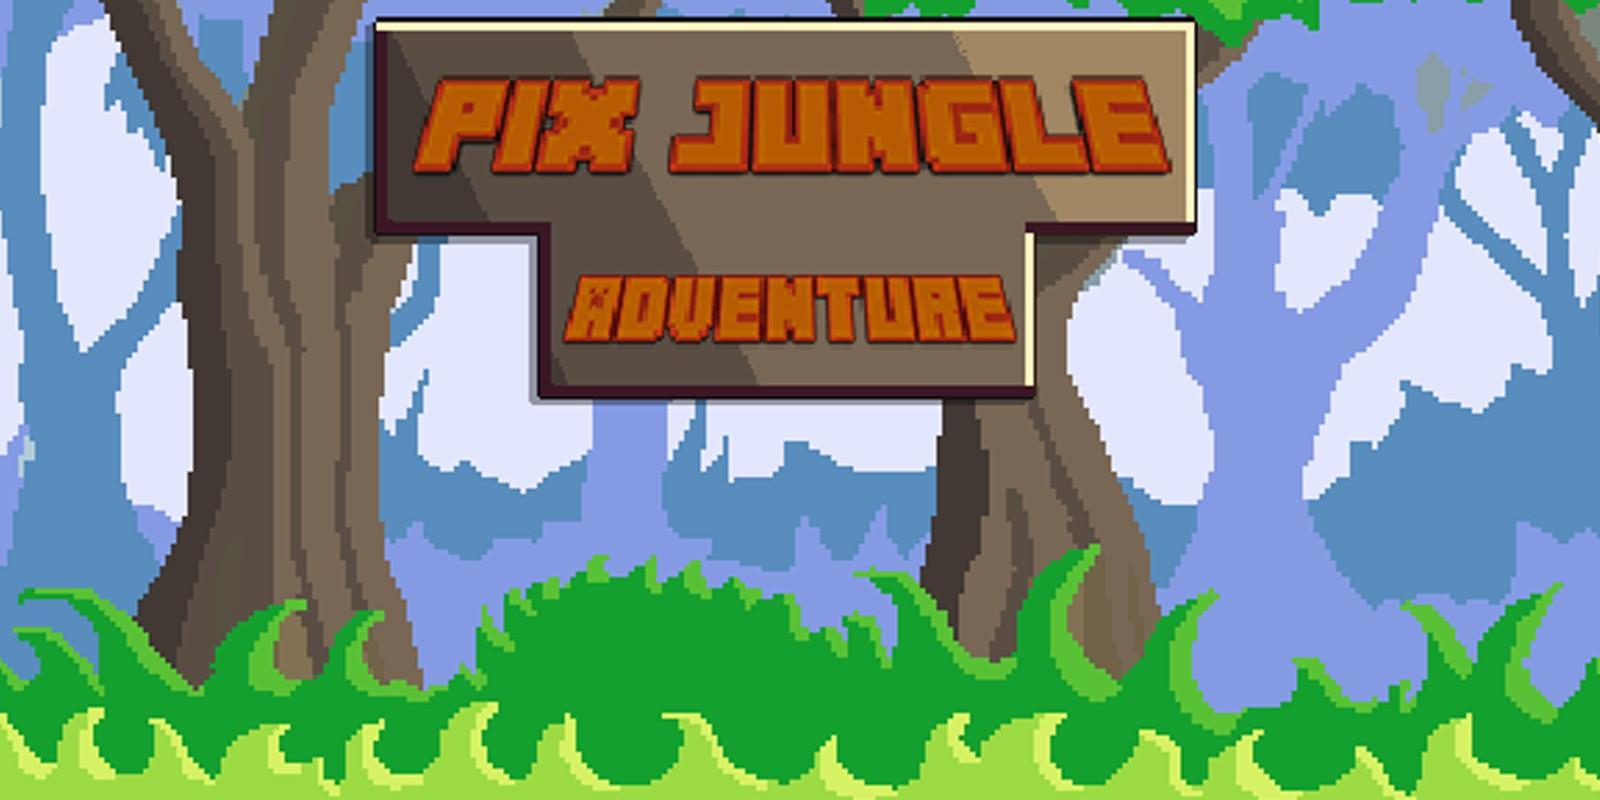 Pix Jungle Adventure - Unity Project